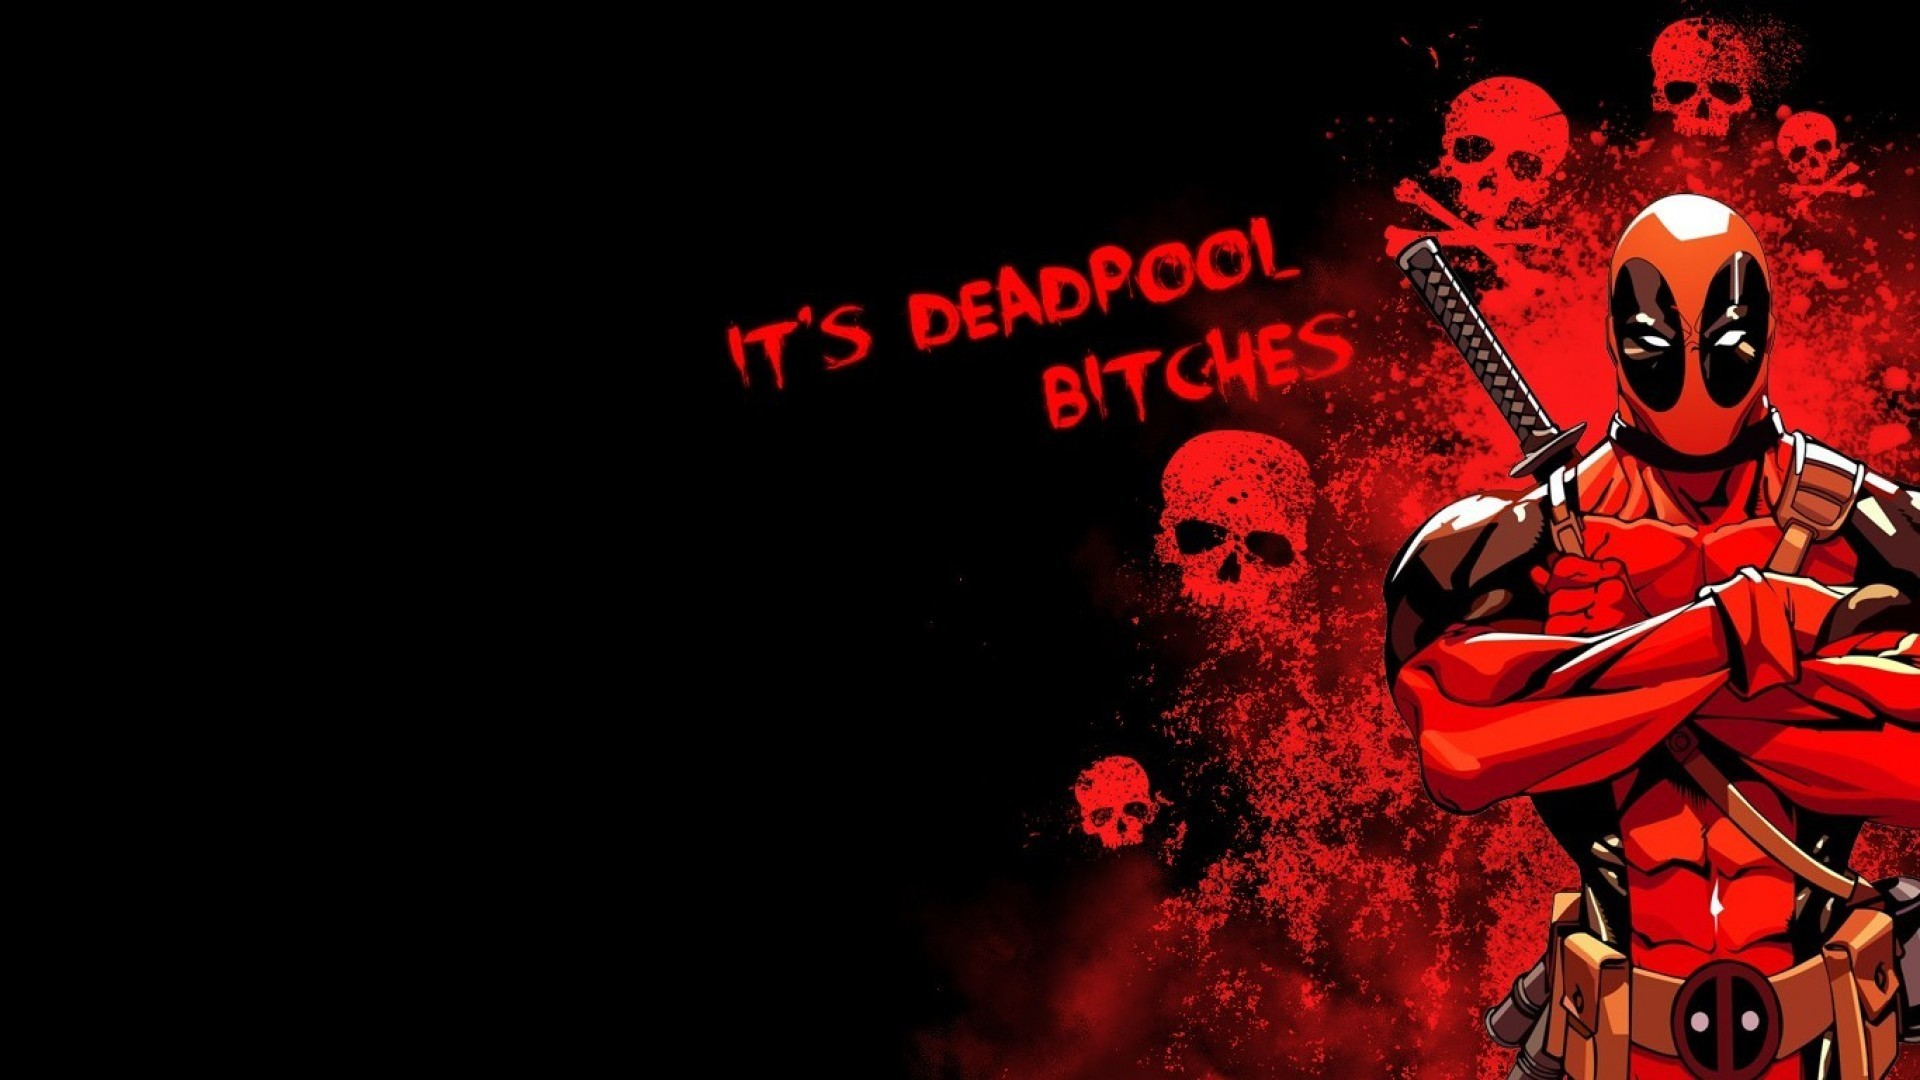 Wallpapers Deadpool | Wallpaper Deadpool | Pinterest | Deadpool wallpaper,  Deadpool and Wallpaper